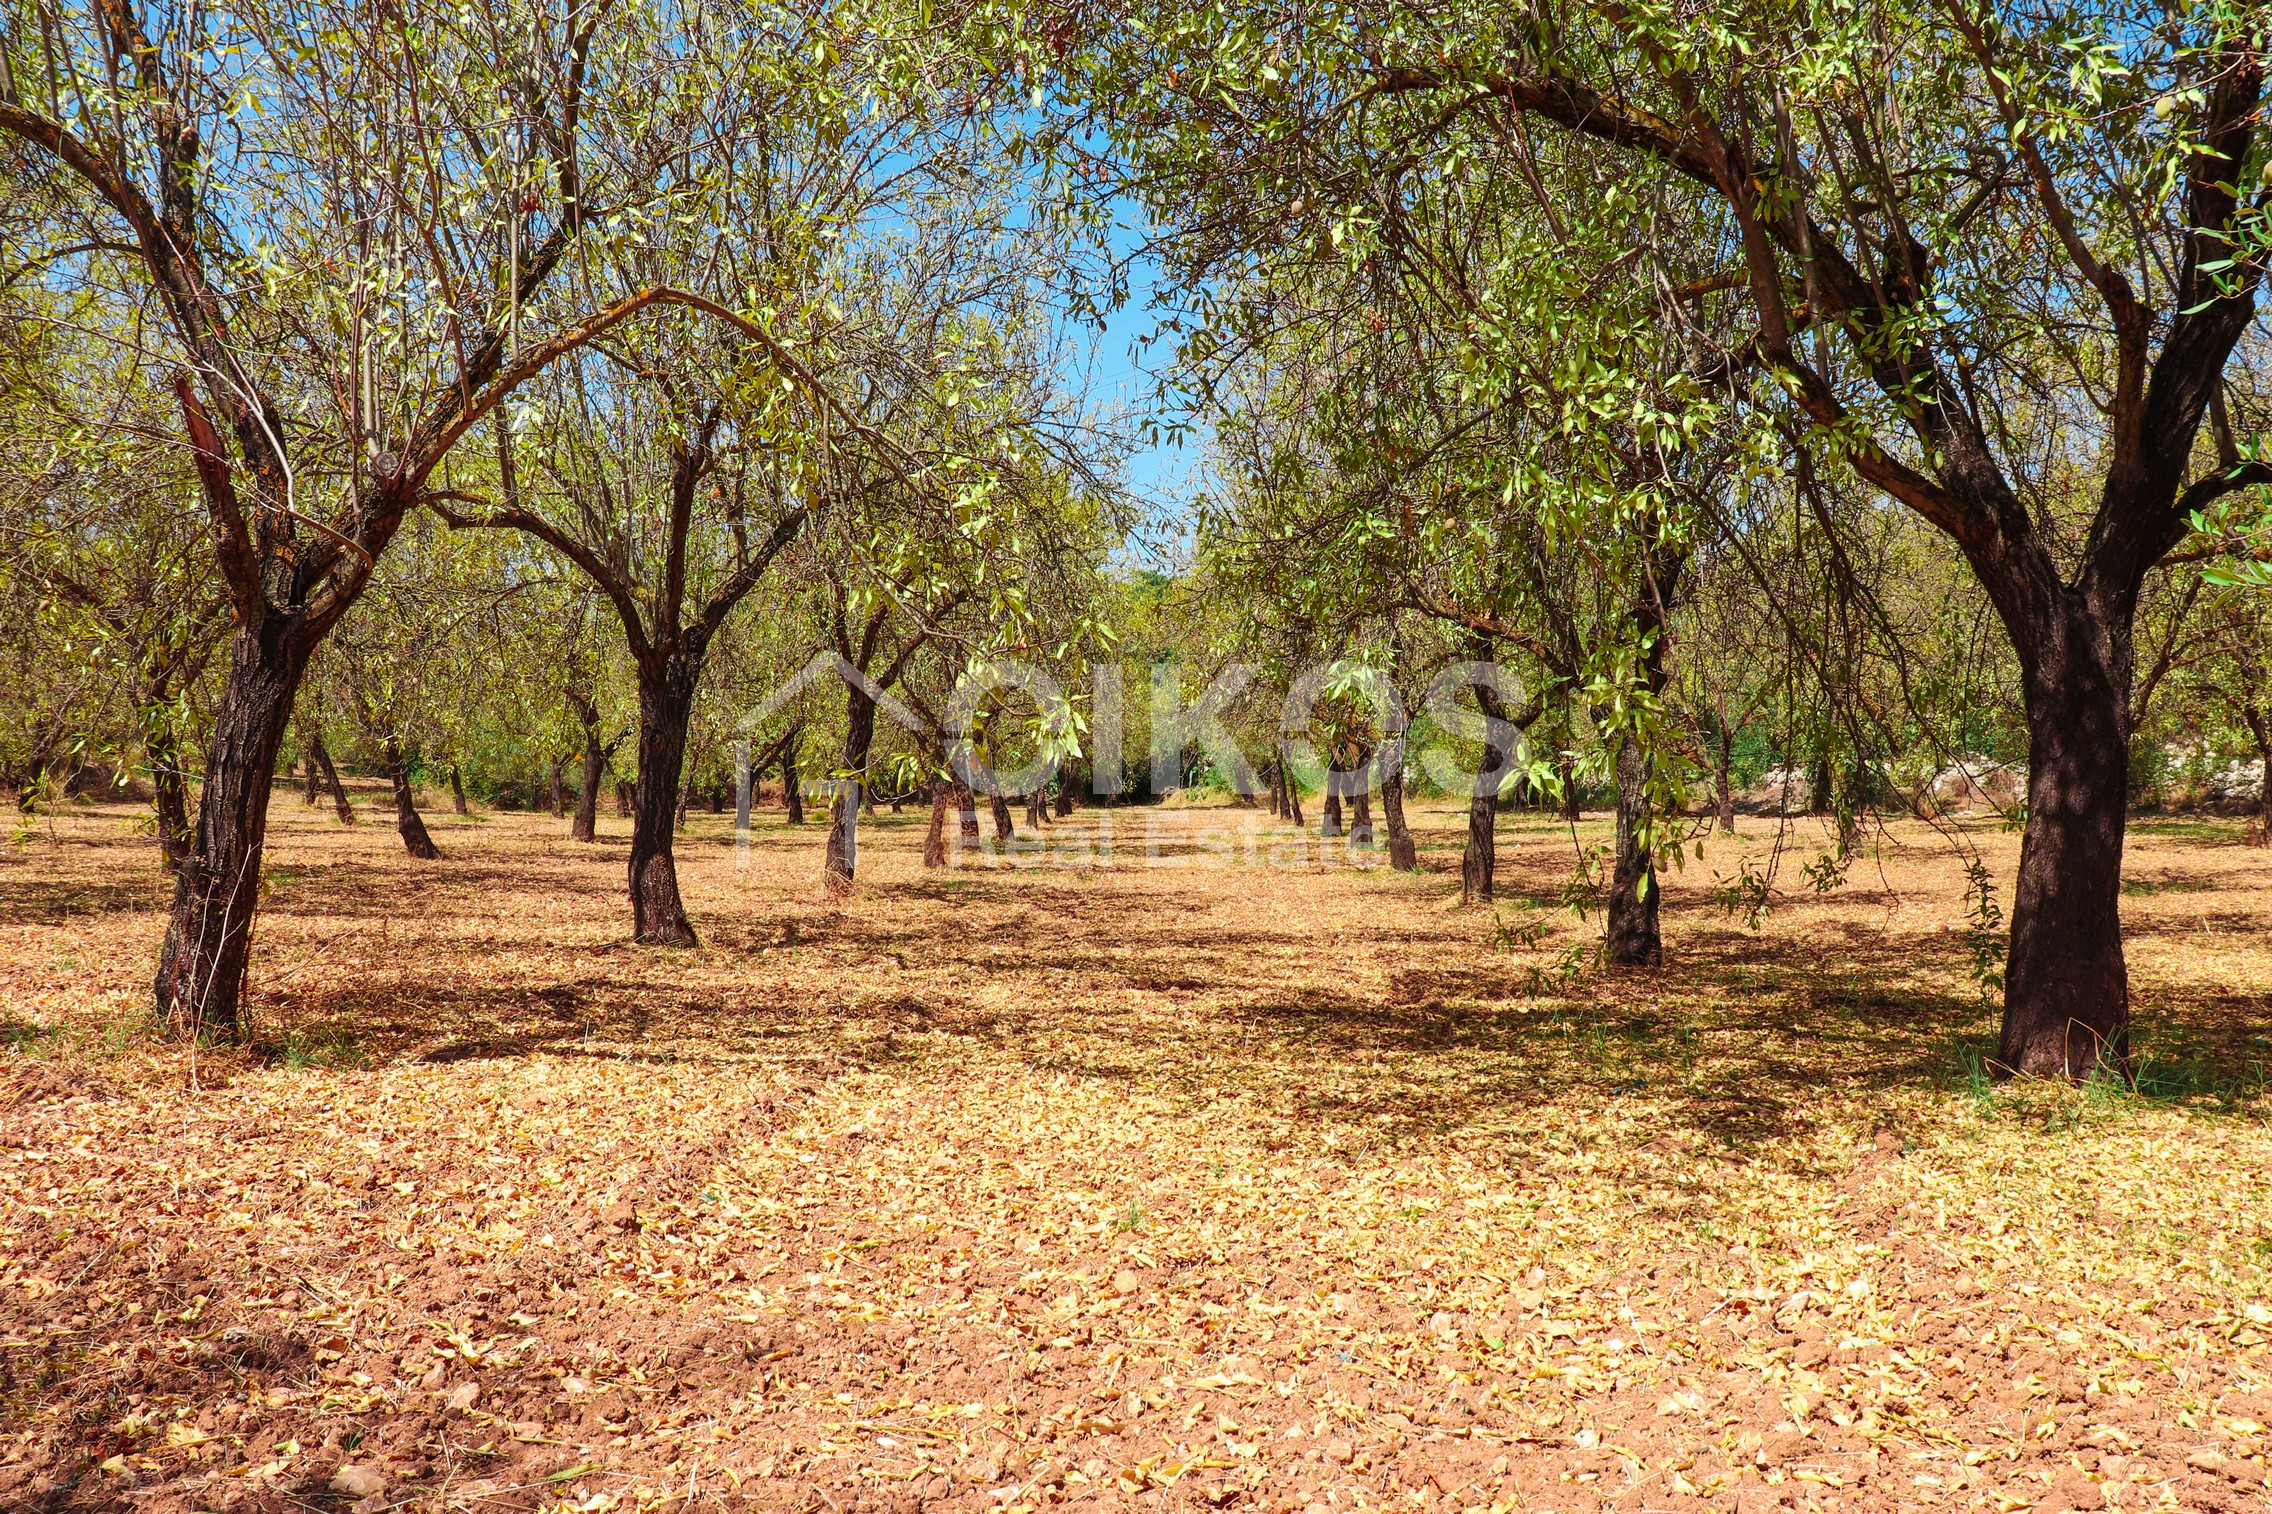 Terreno artigianale in contrada Zisola06